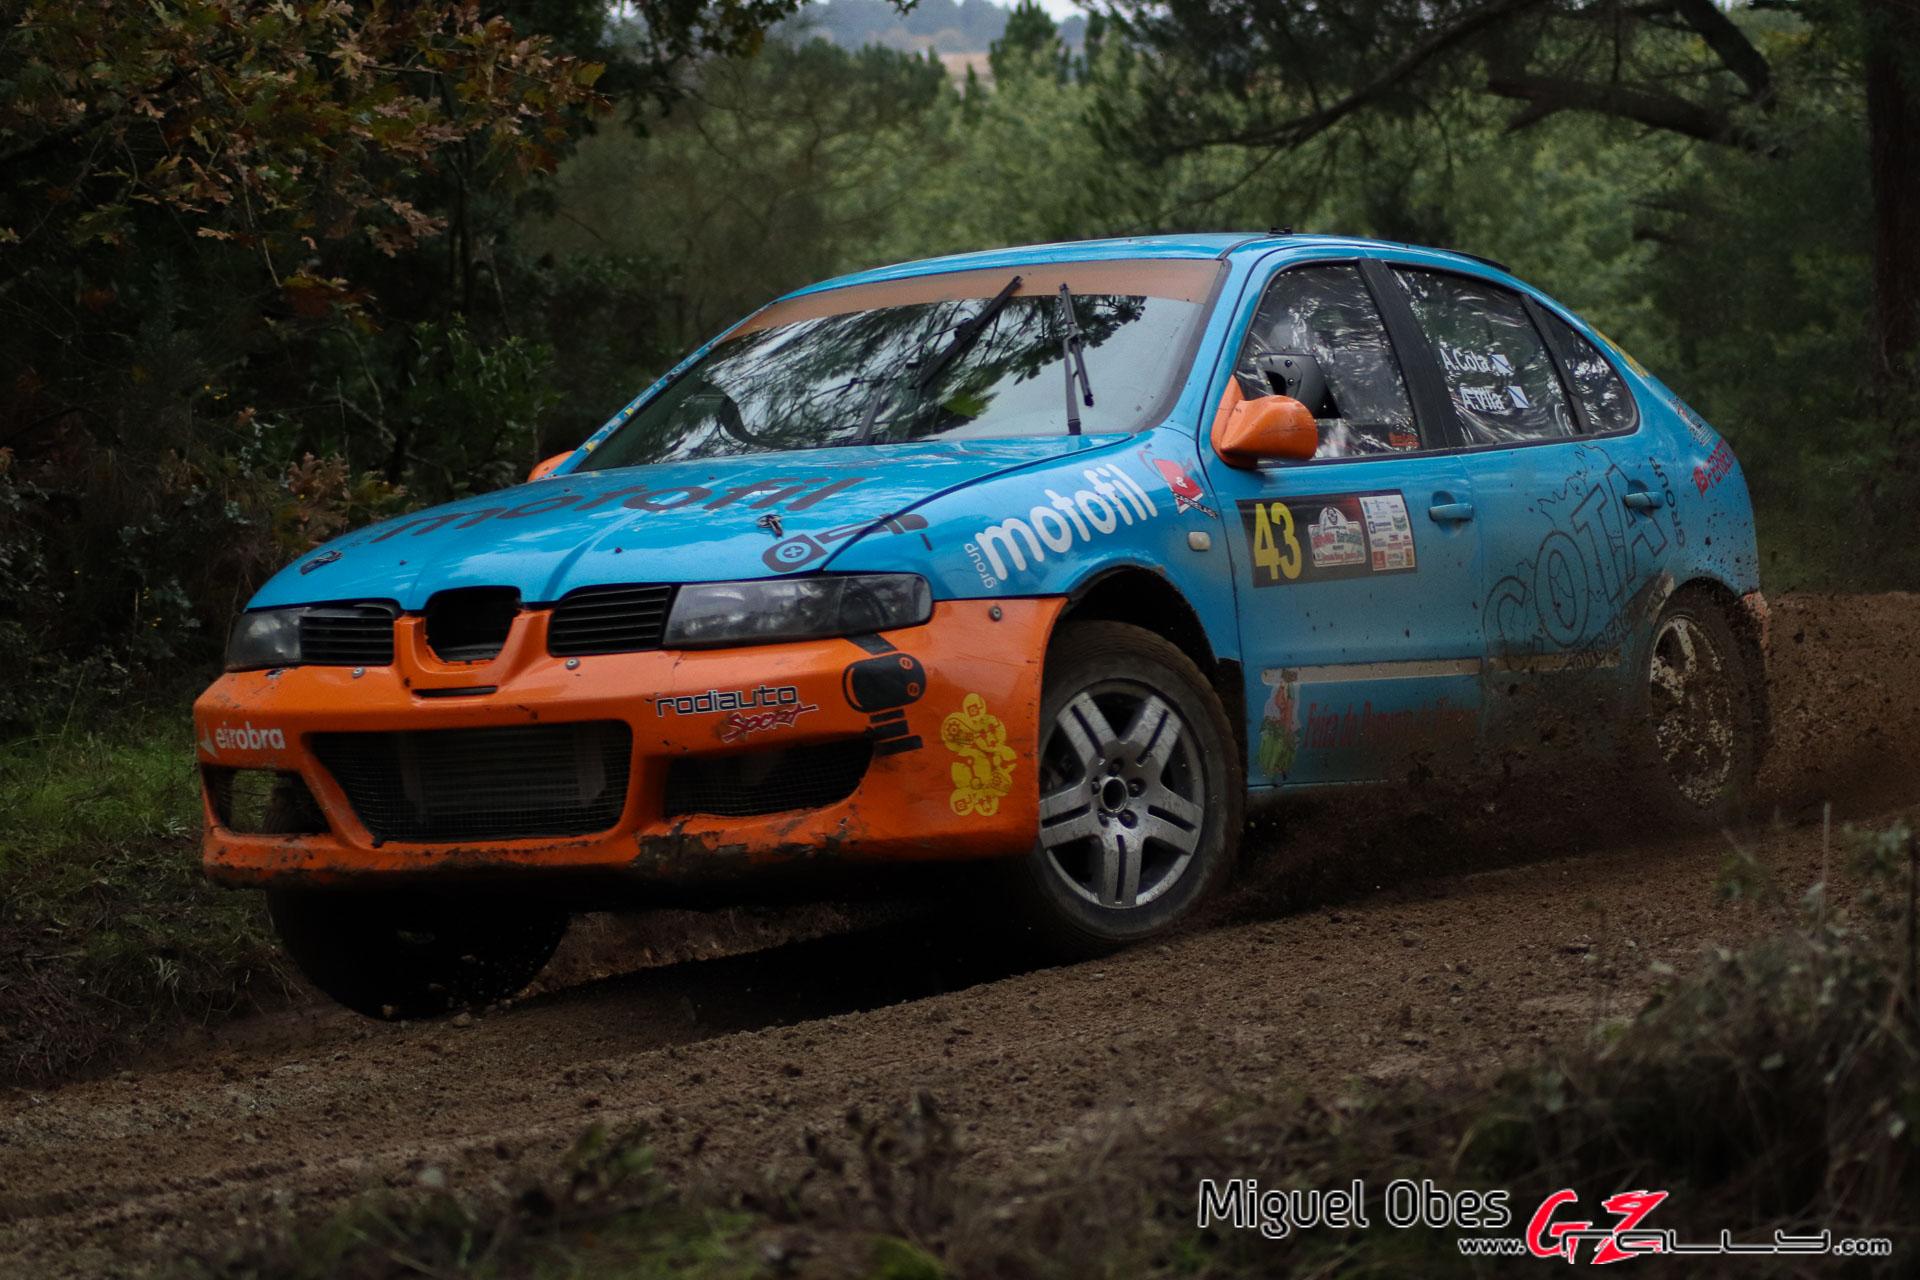 Rallymix de Barbadás - Miguel Obes